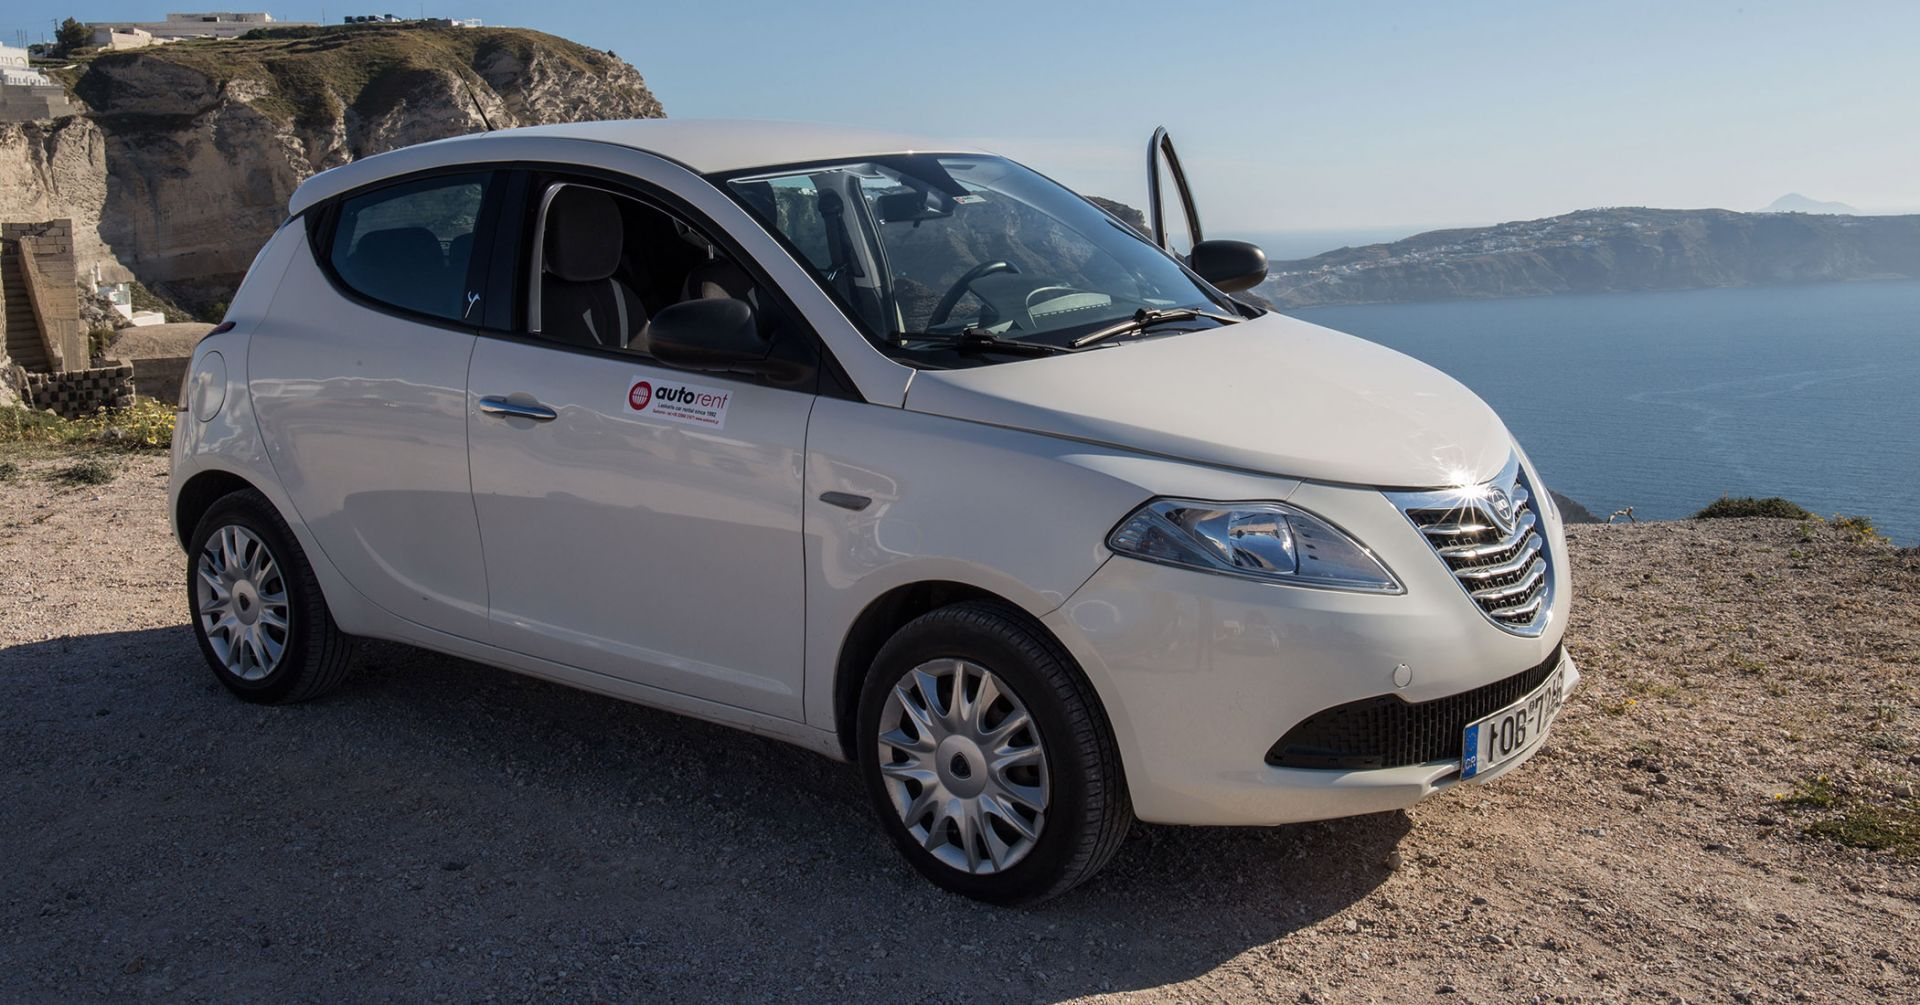 Car Rentals In Santorini Greece Auto Rent - Cool cars santorini